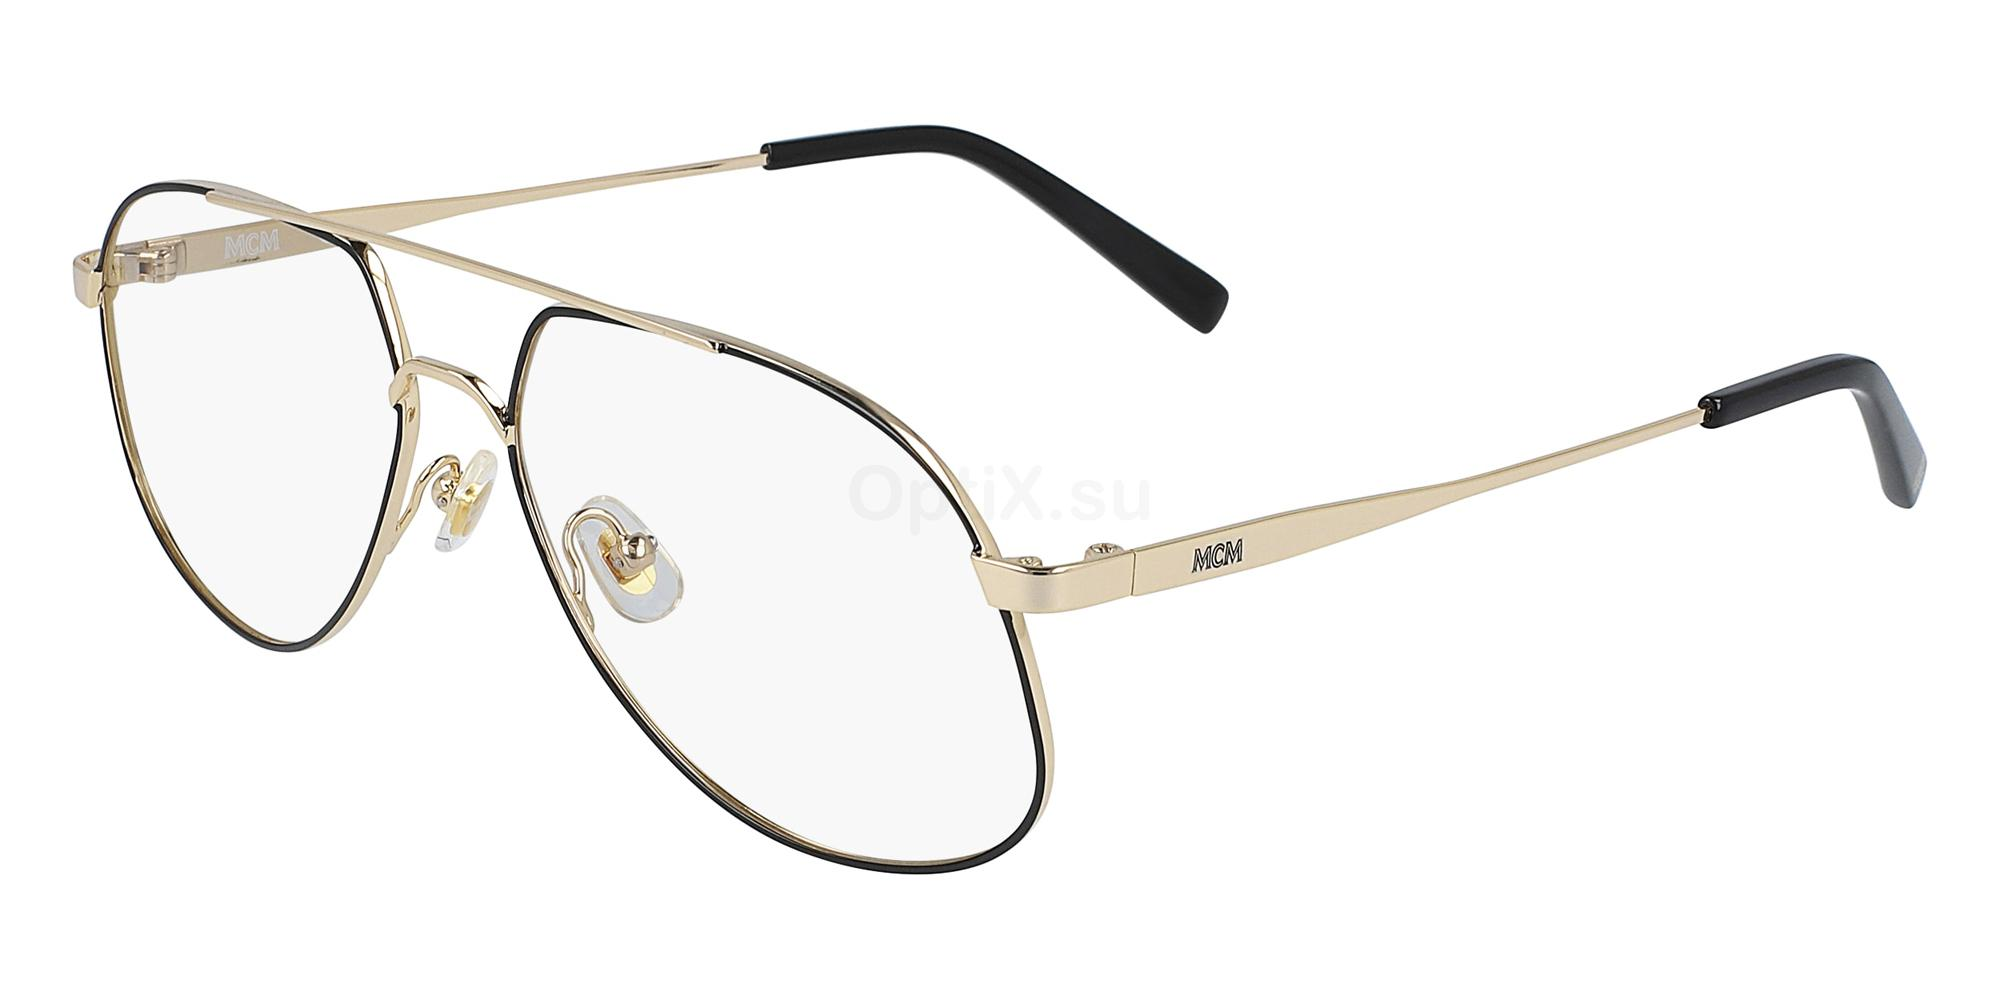 001 MCM2138 Glasses, MCM